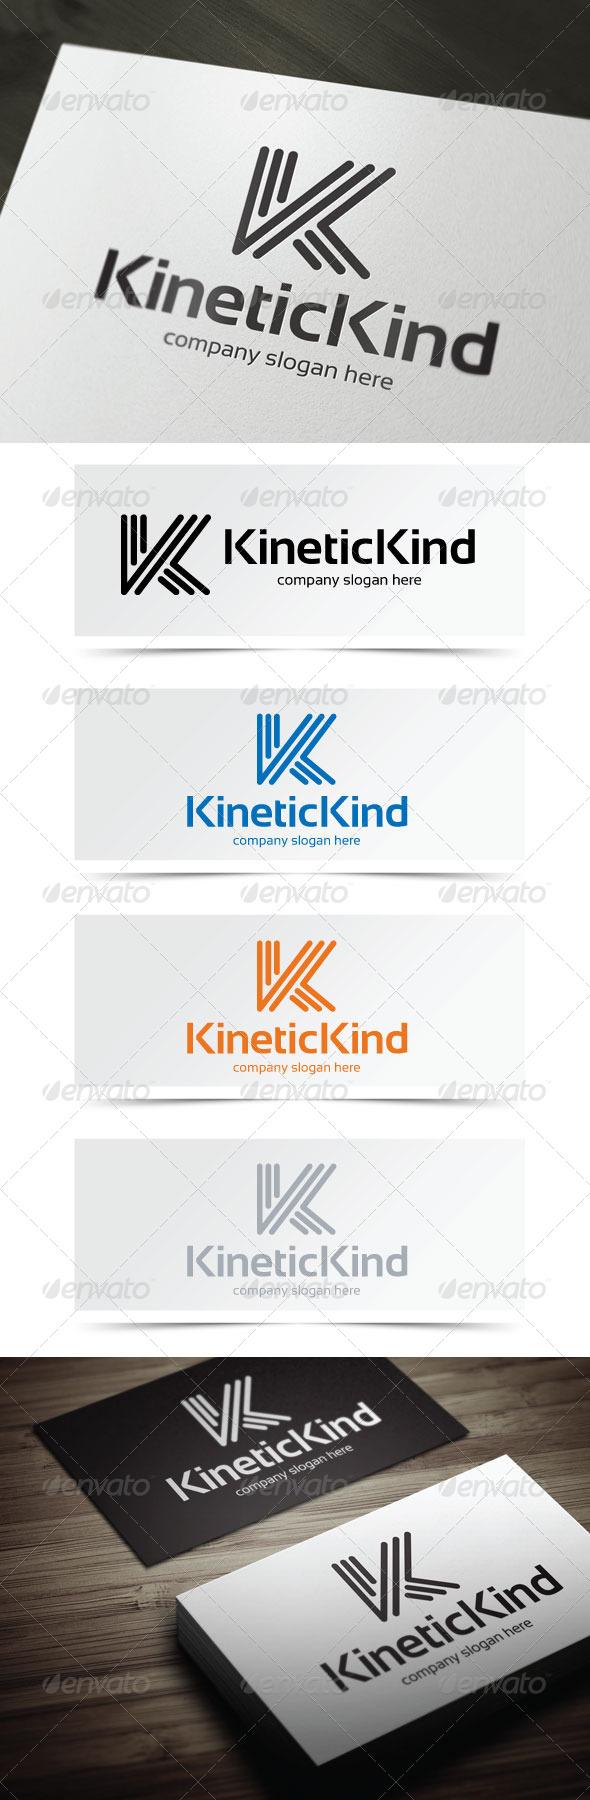 GraphicRiver Kinetic Kind 5142274